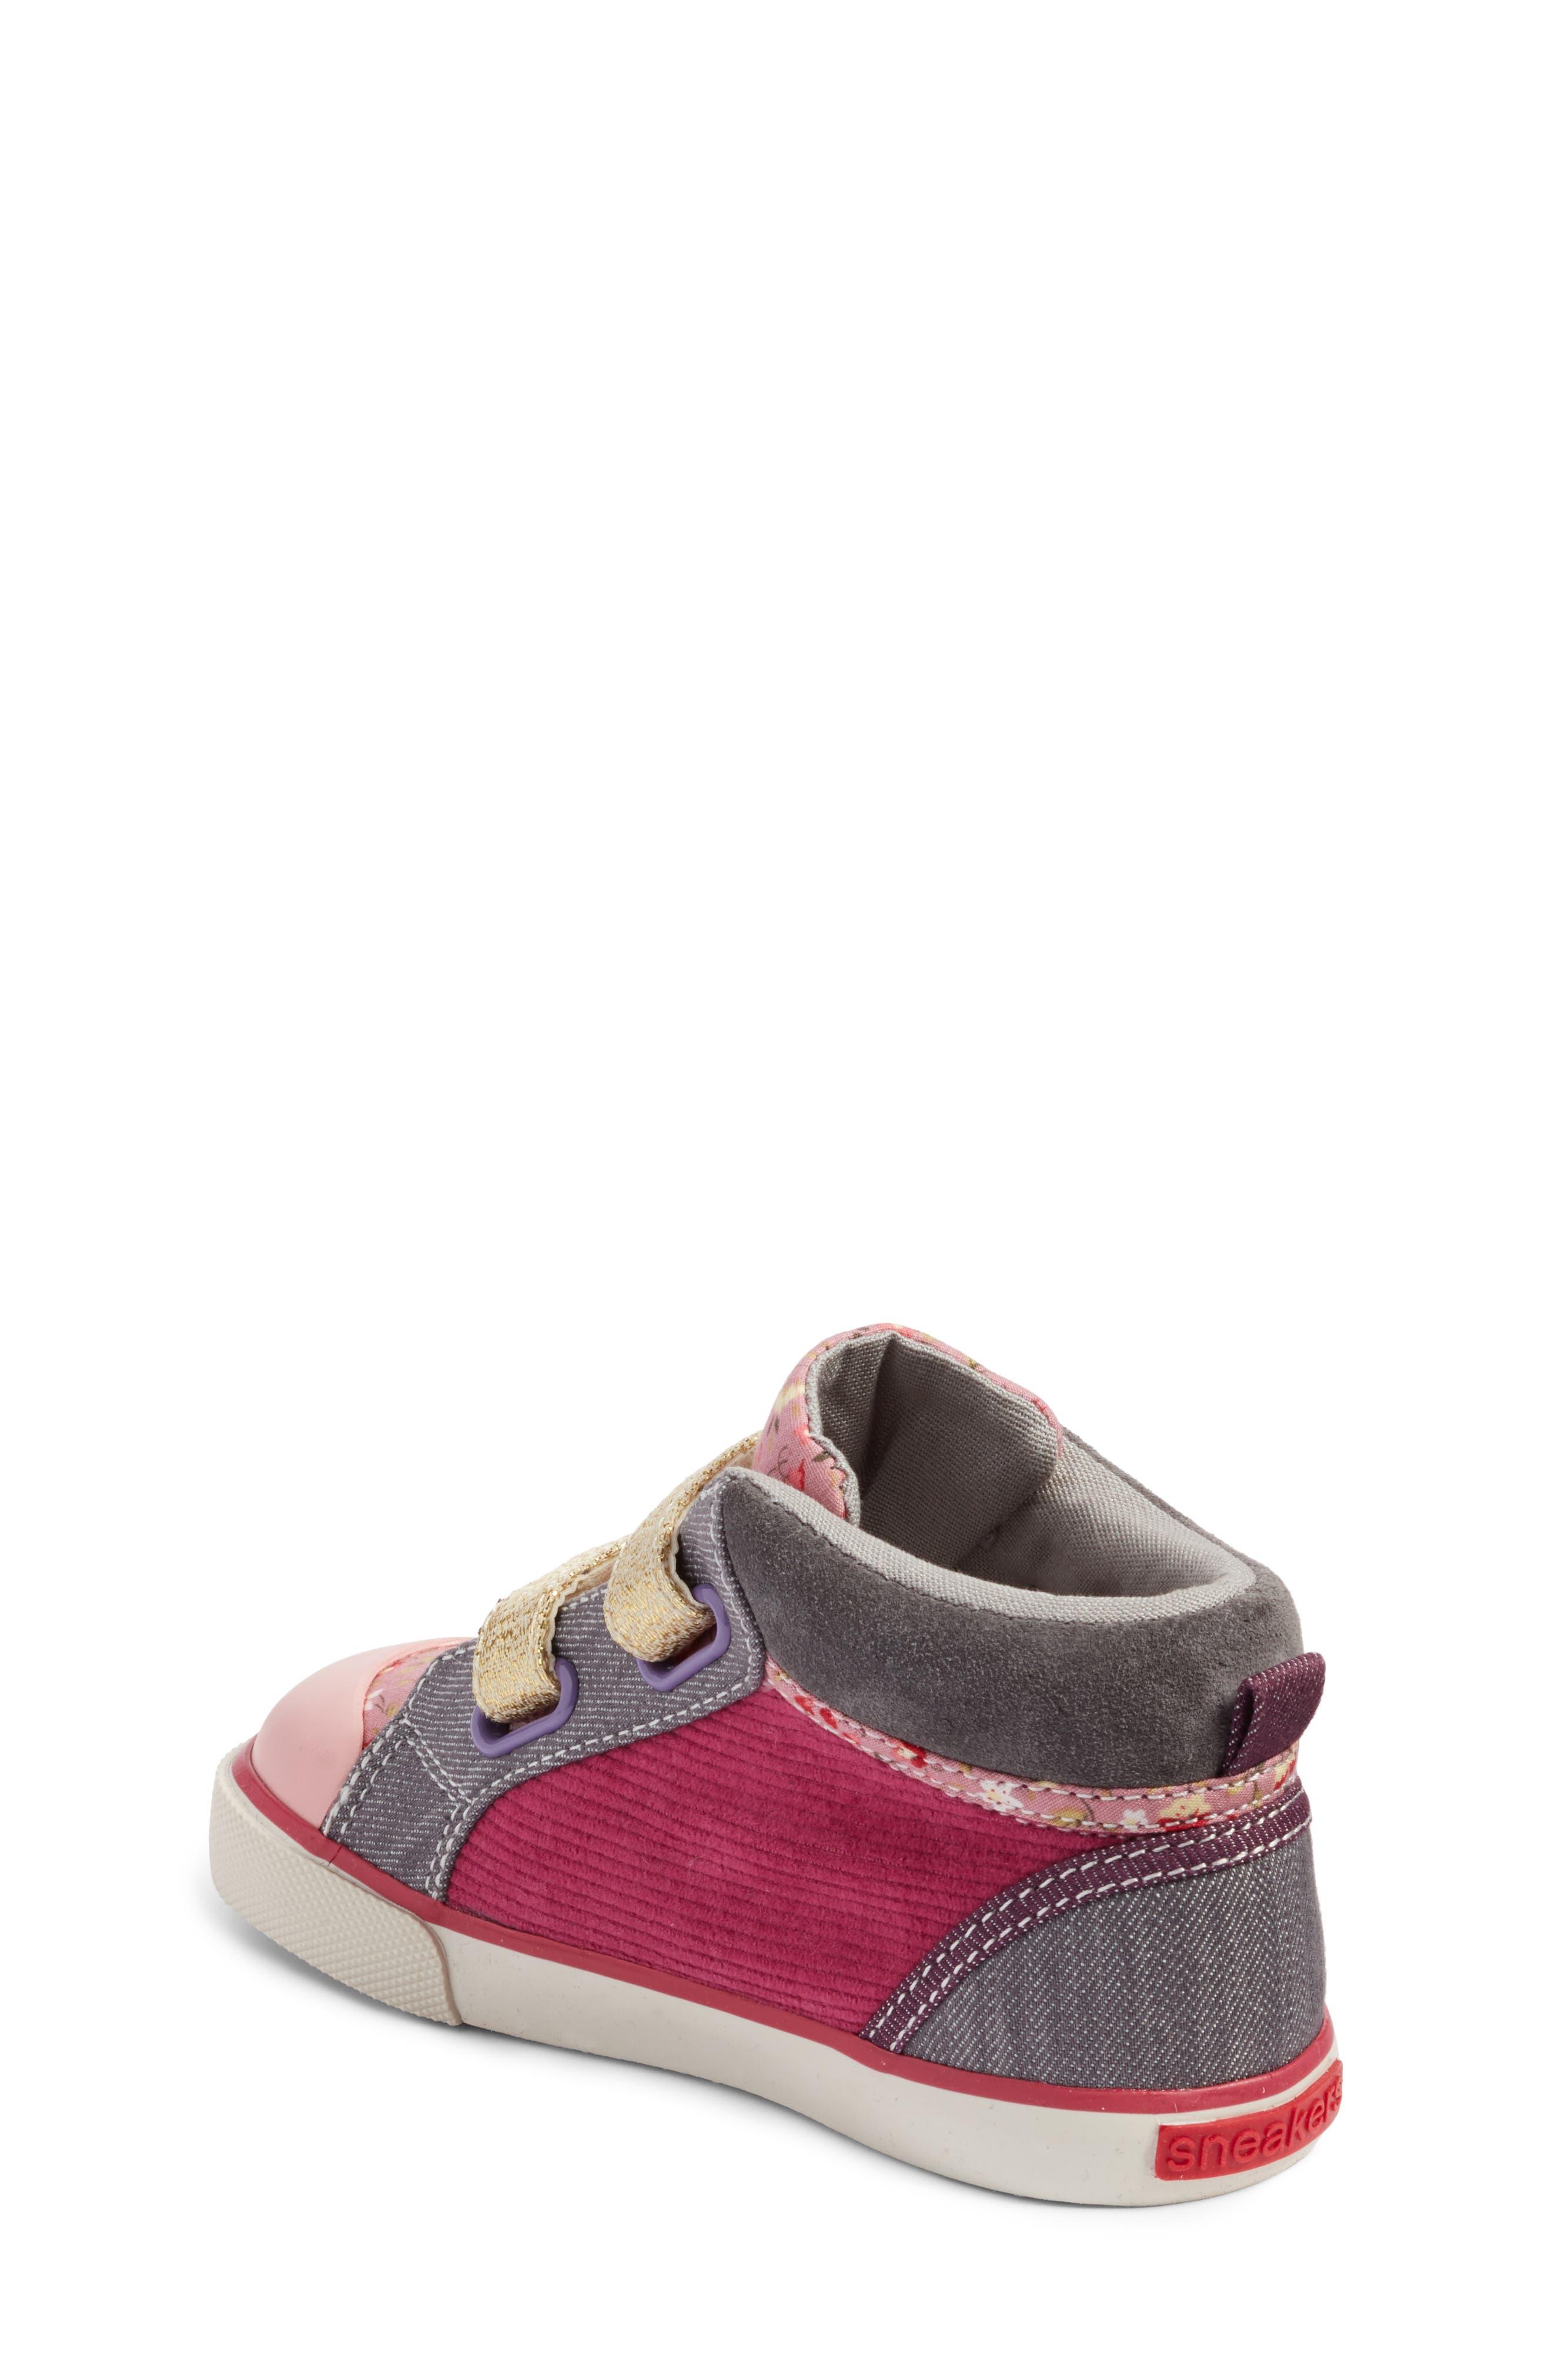 Alternate Image 2  - See Kai Run Kya Sneaker (Baby, Walker, Toddler & Little Kid)